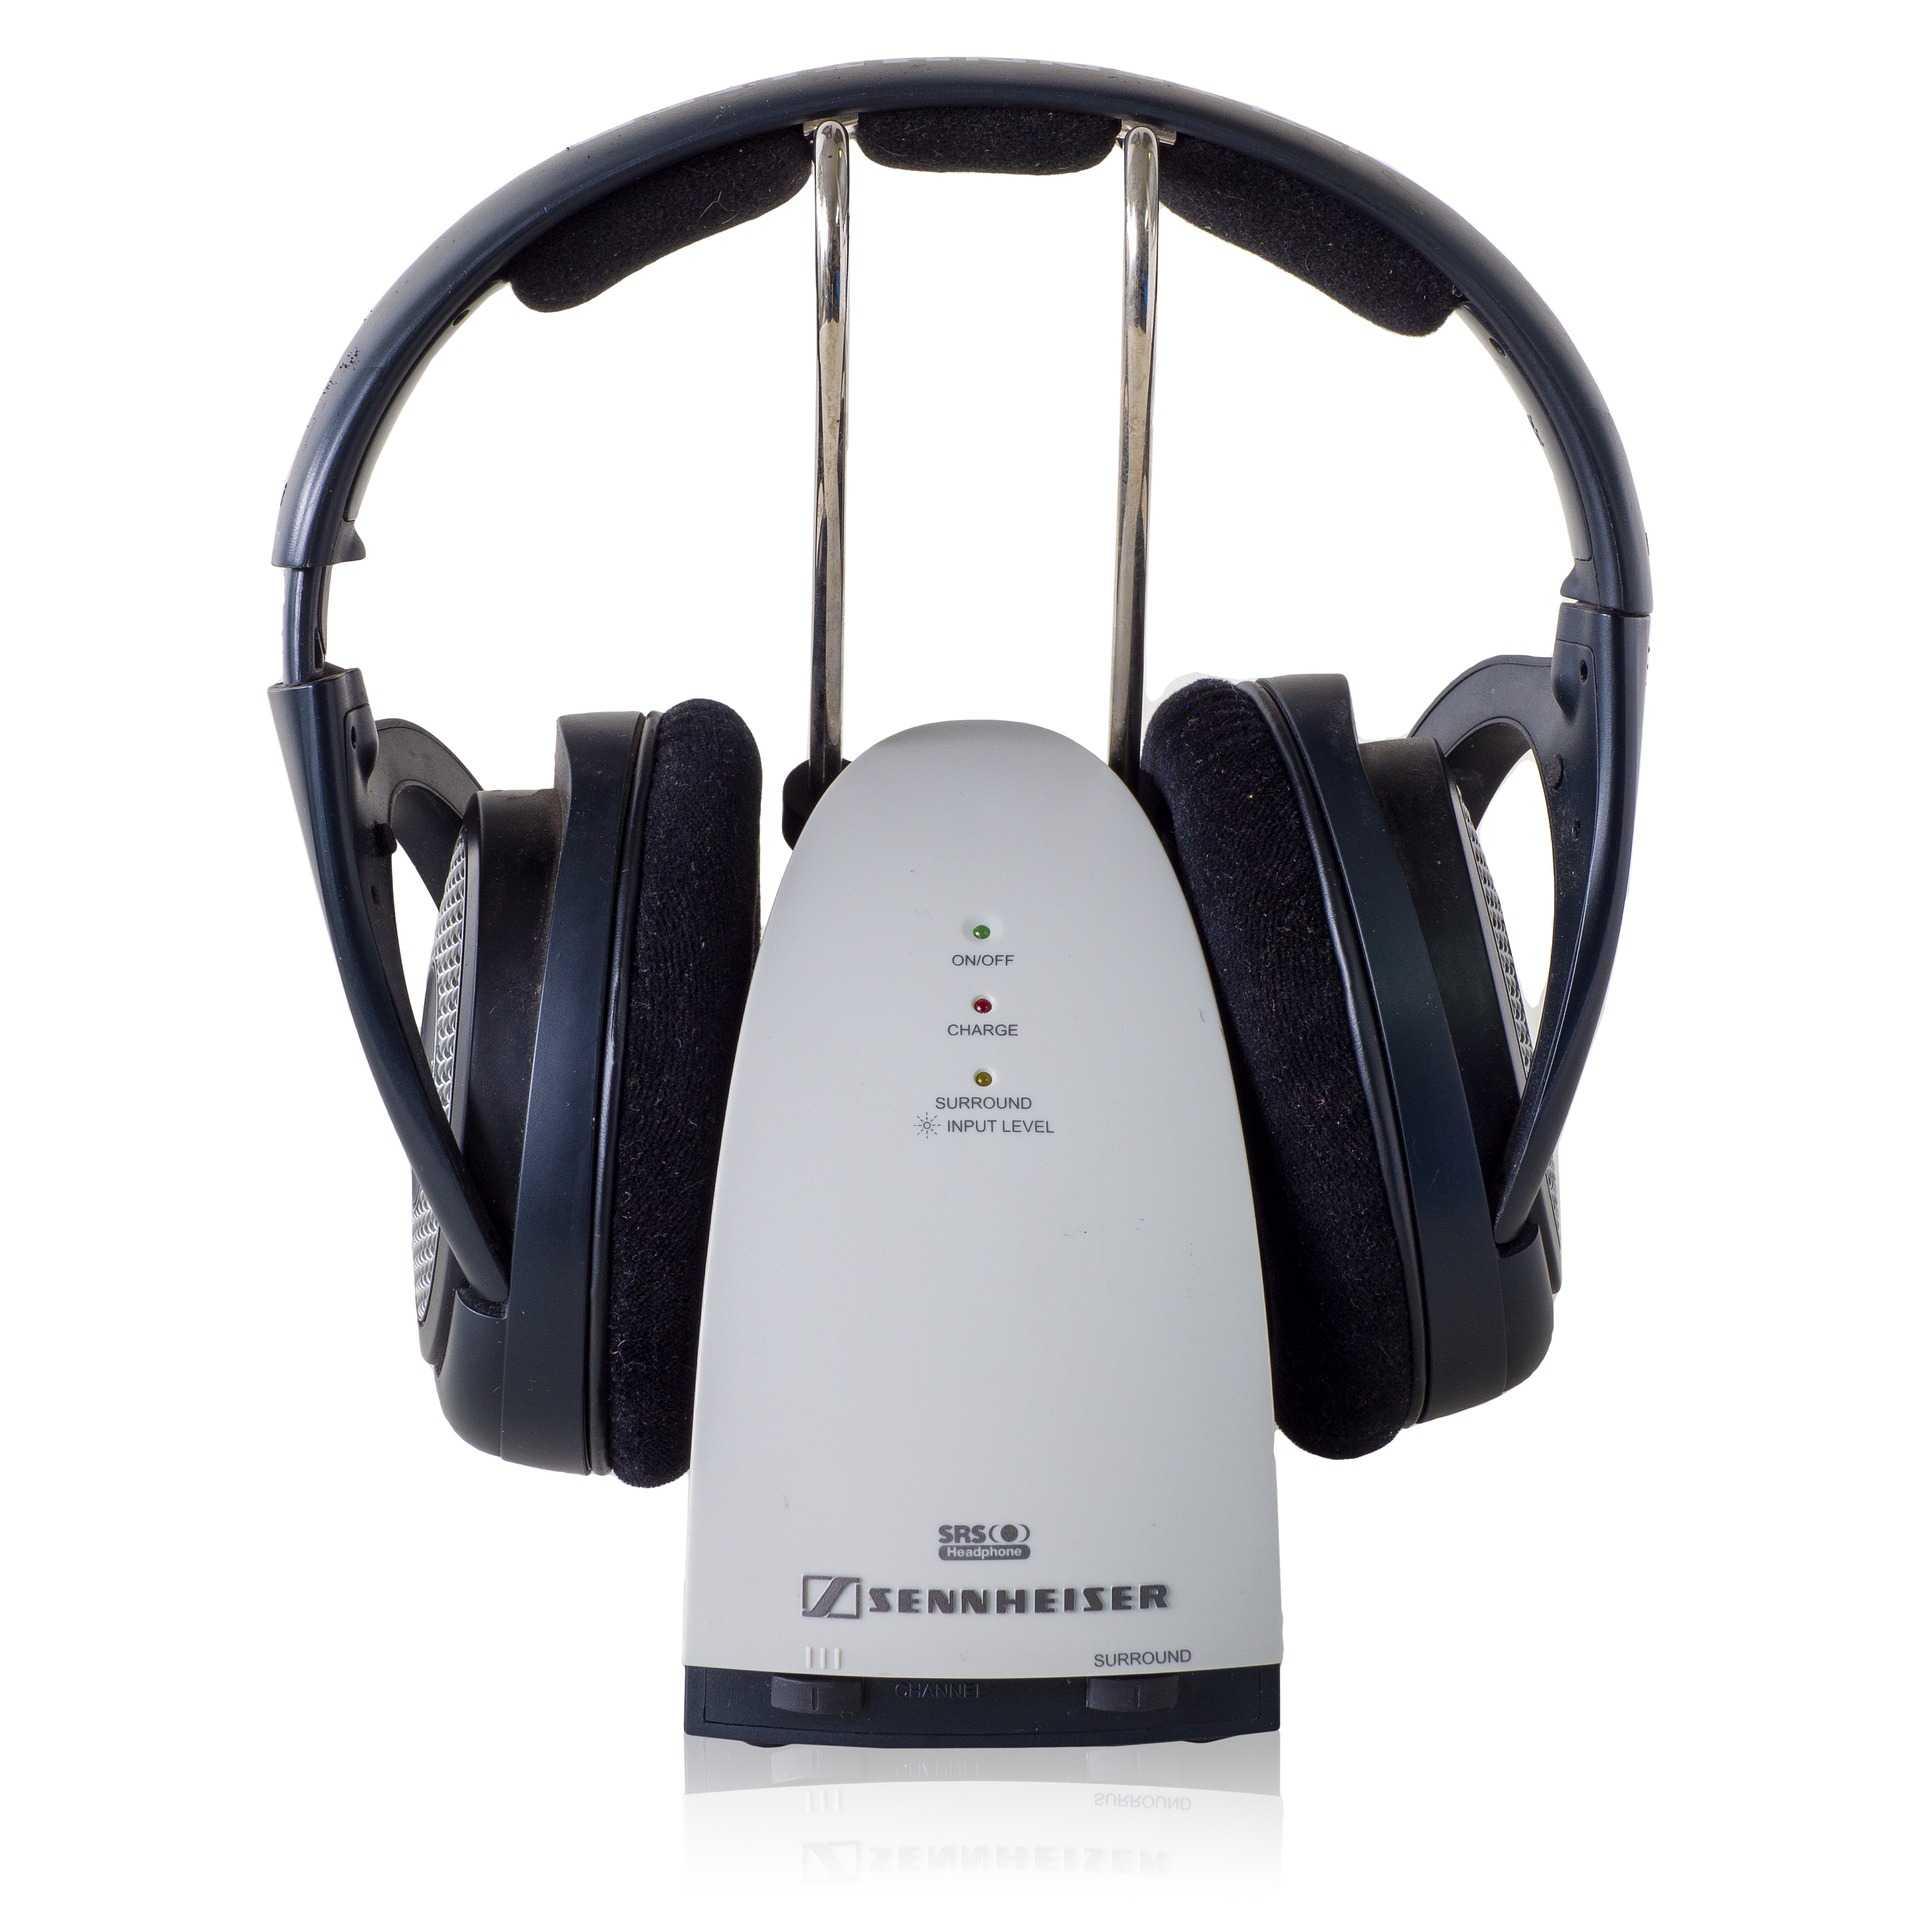 sennheiser noise cancelling headphones